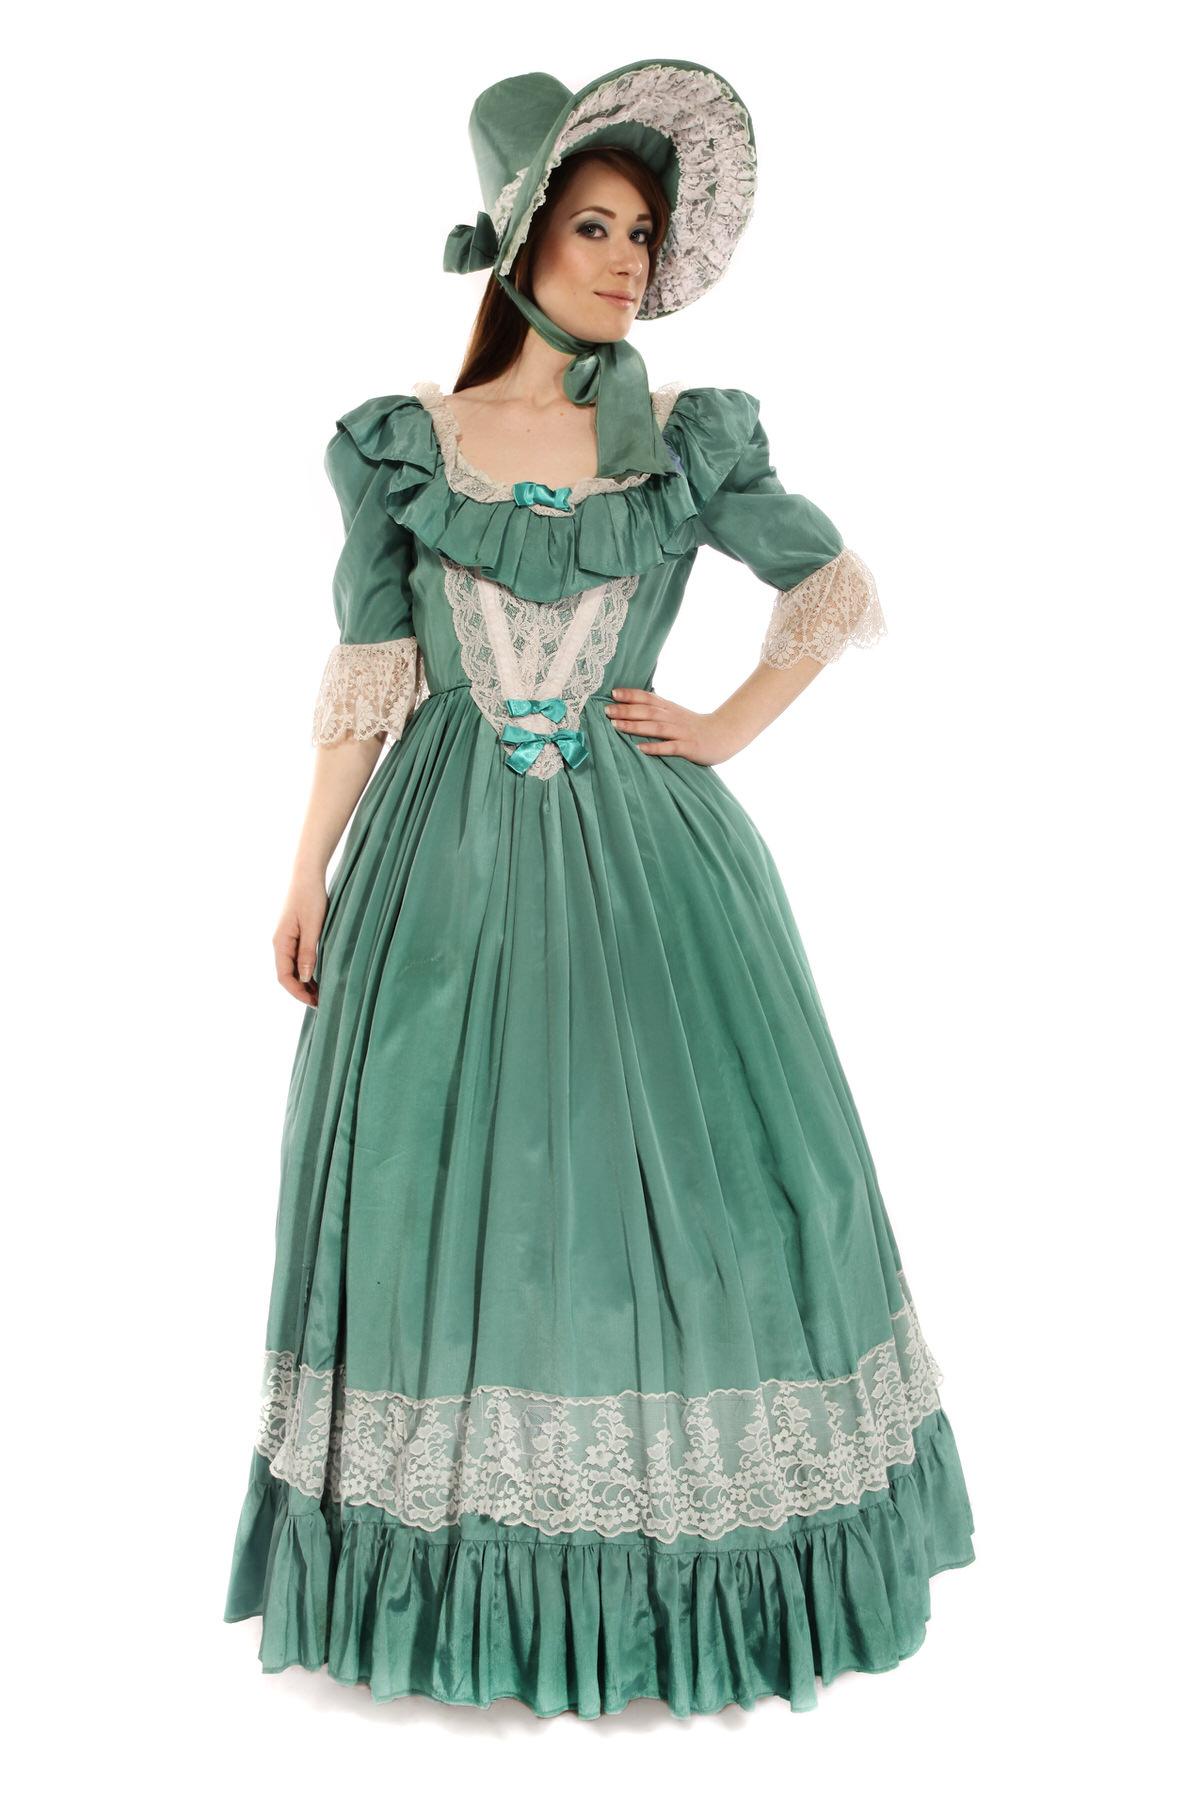 GEORGIAN GREEN DRESS COSTUME W MATCHING HAT